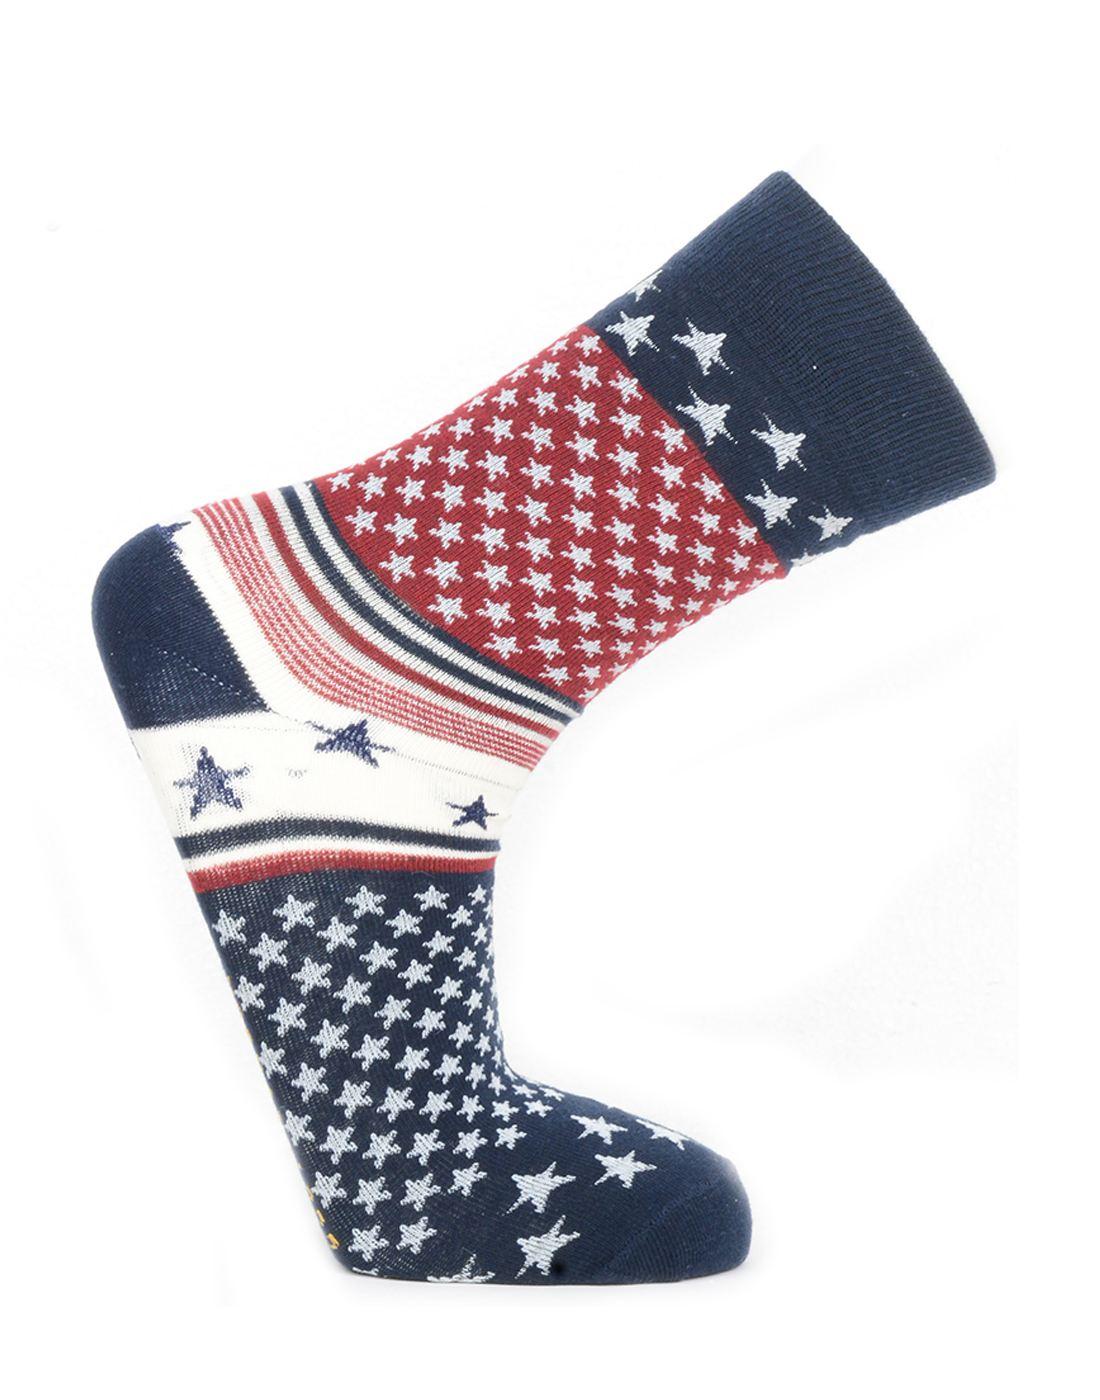 Norman Todd Women Multi-Coloured Mid-calf Length Socks